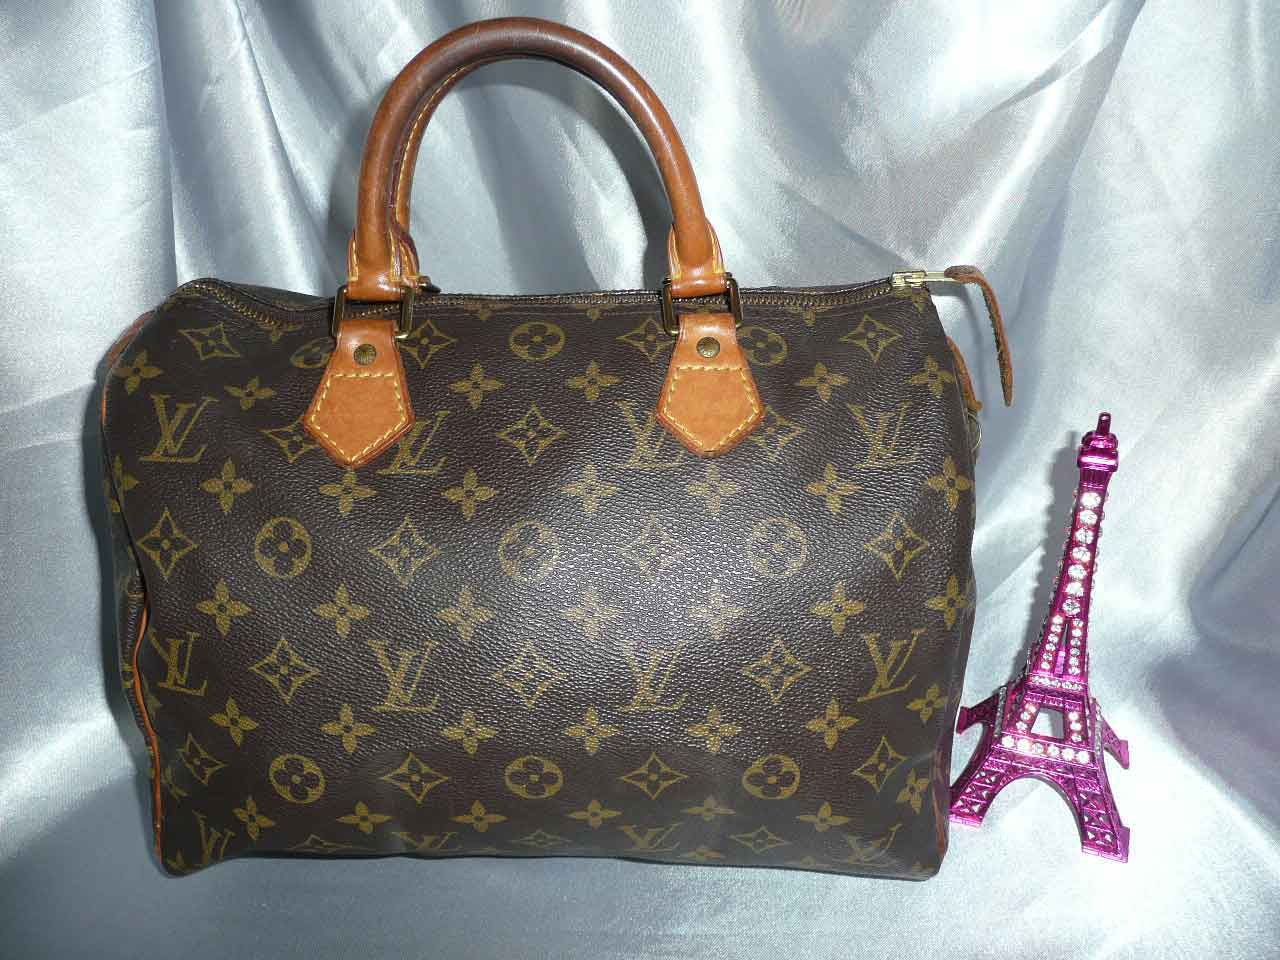 Sac Louis Vuitton Monogramme